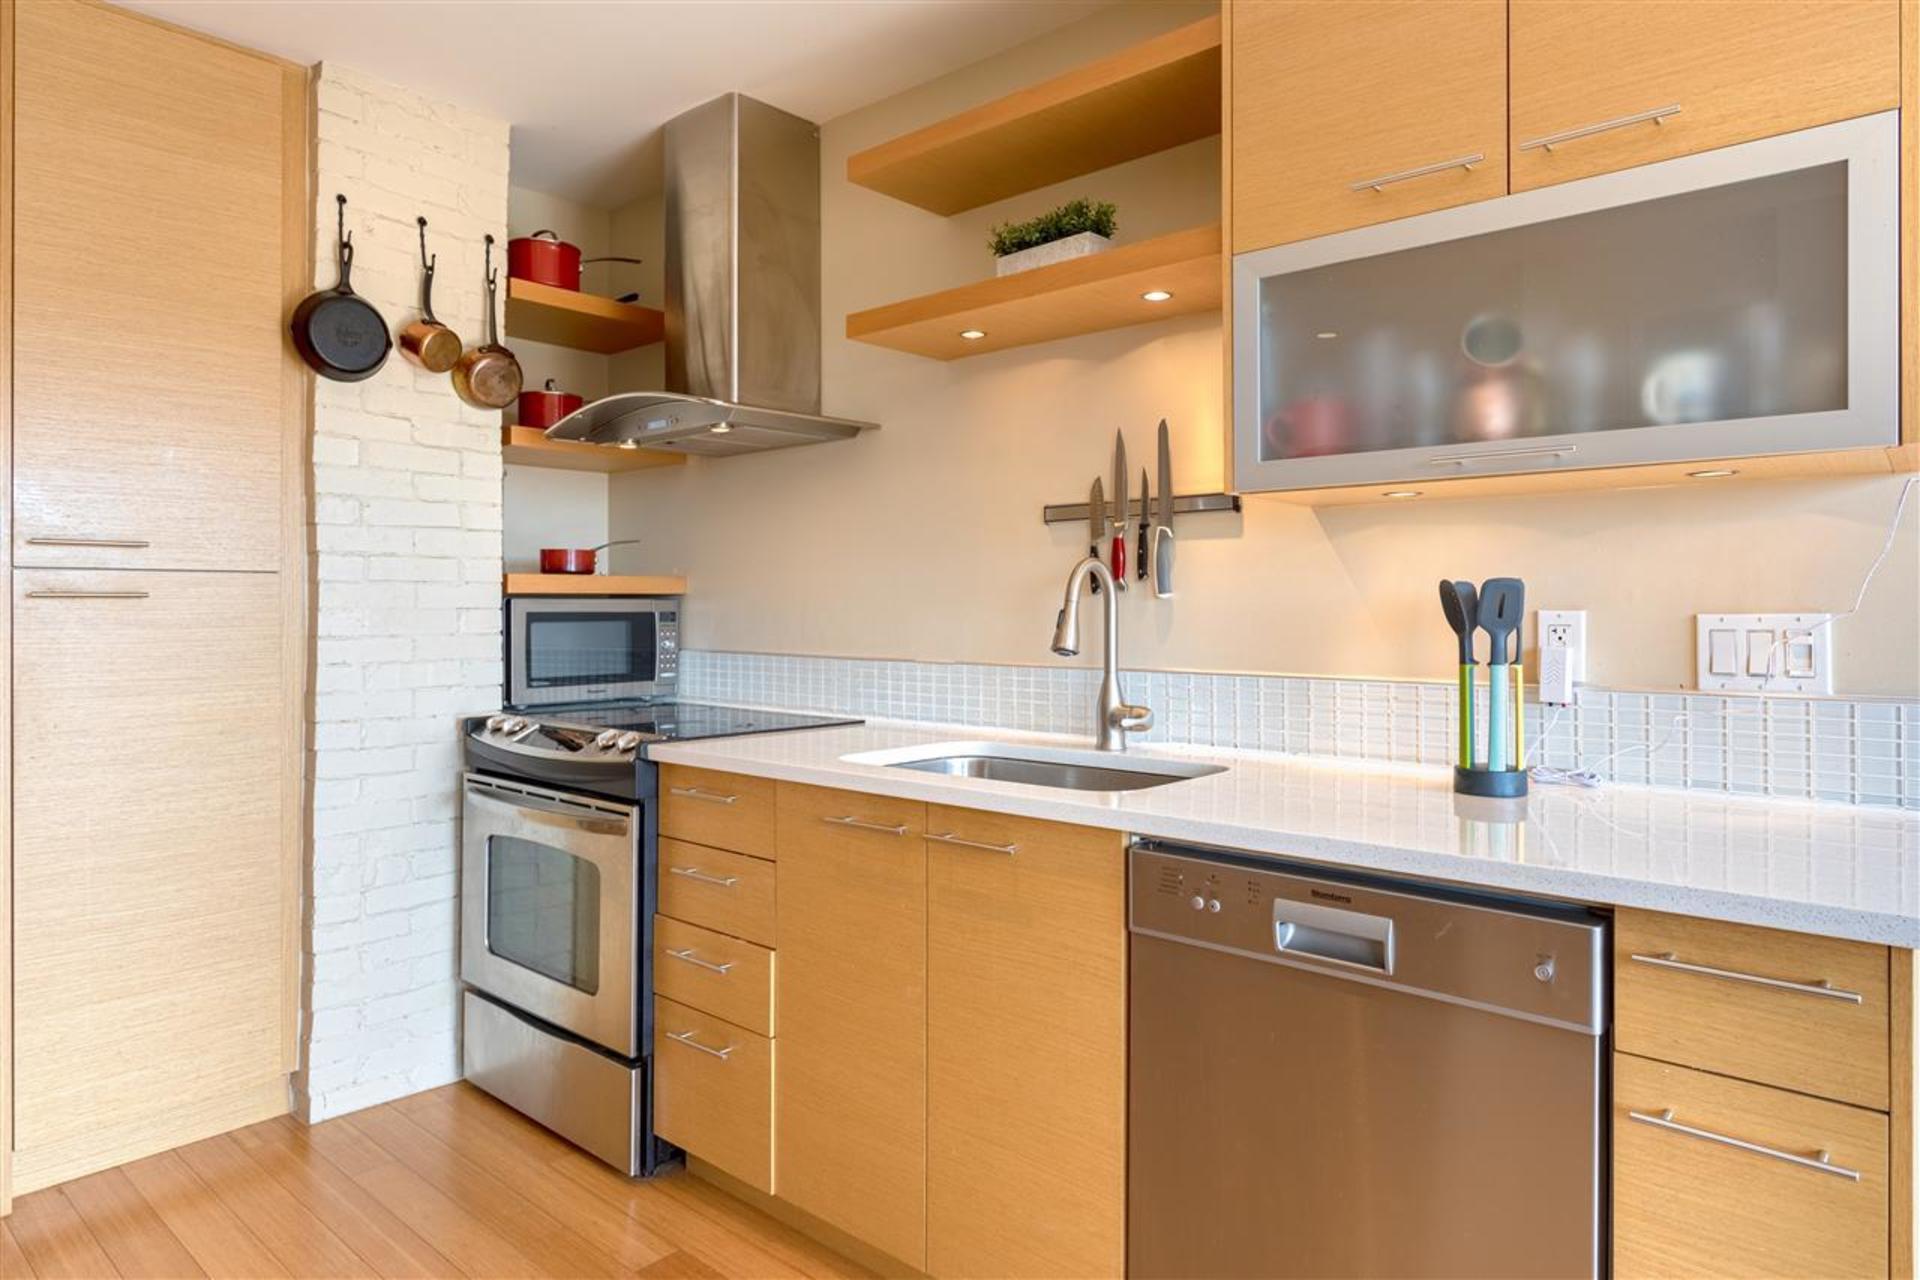 3912-parker-street-willingdon-heights-burnaby-north-06 at 3912 Parker Street, Willingdon Heights, Burnaby North